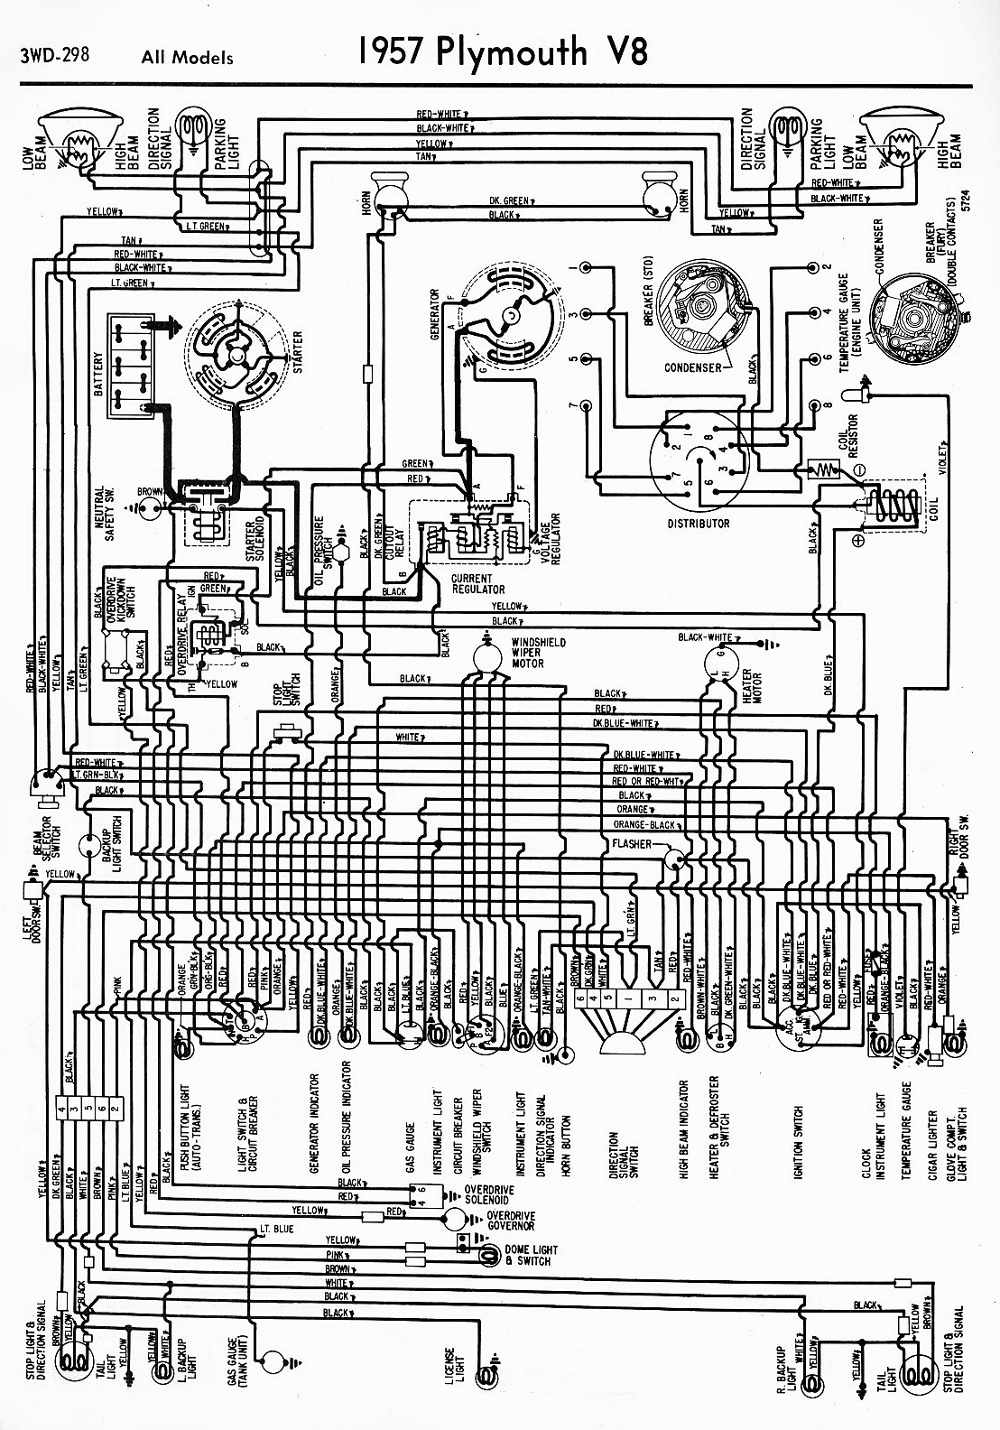 1956 Ford Car Wiring Diagram As Well Plymouth Diagrams Belvedere Diy U2022 Rh Dancesalsa Co